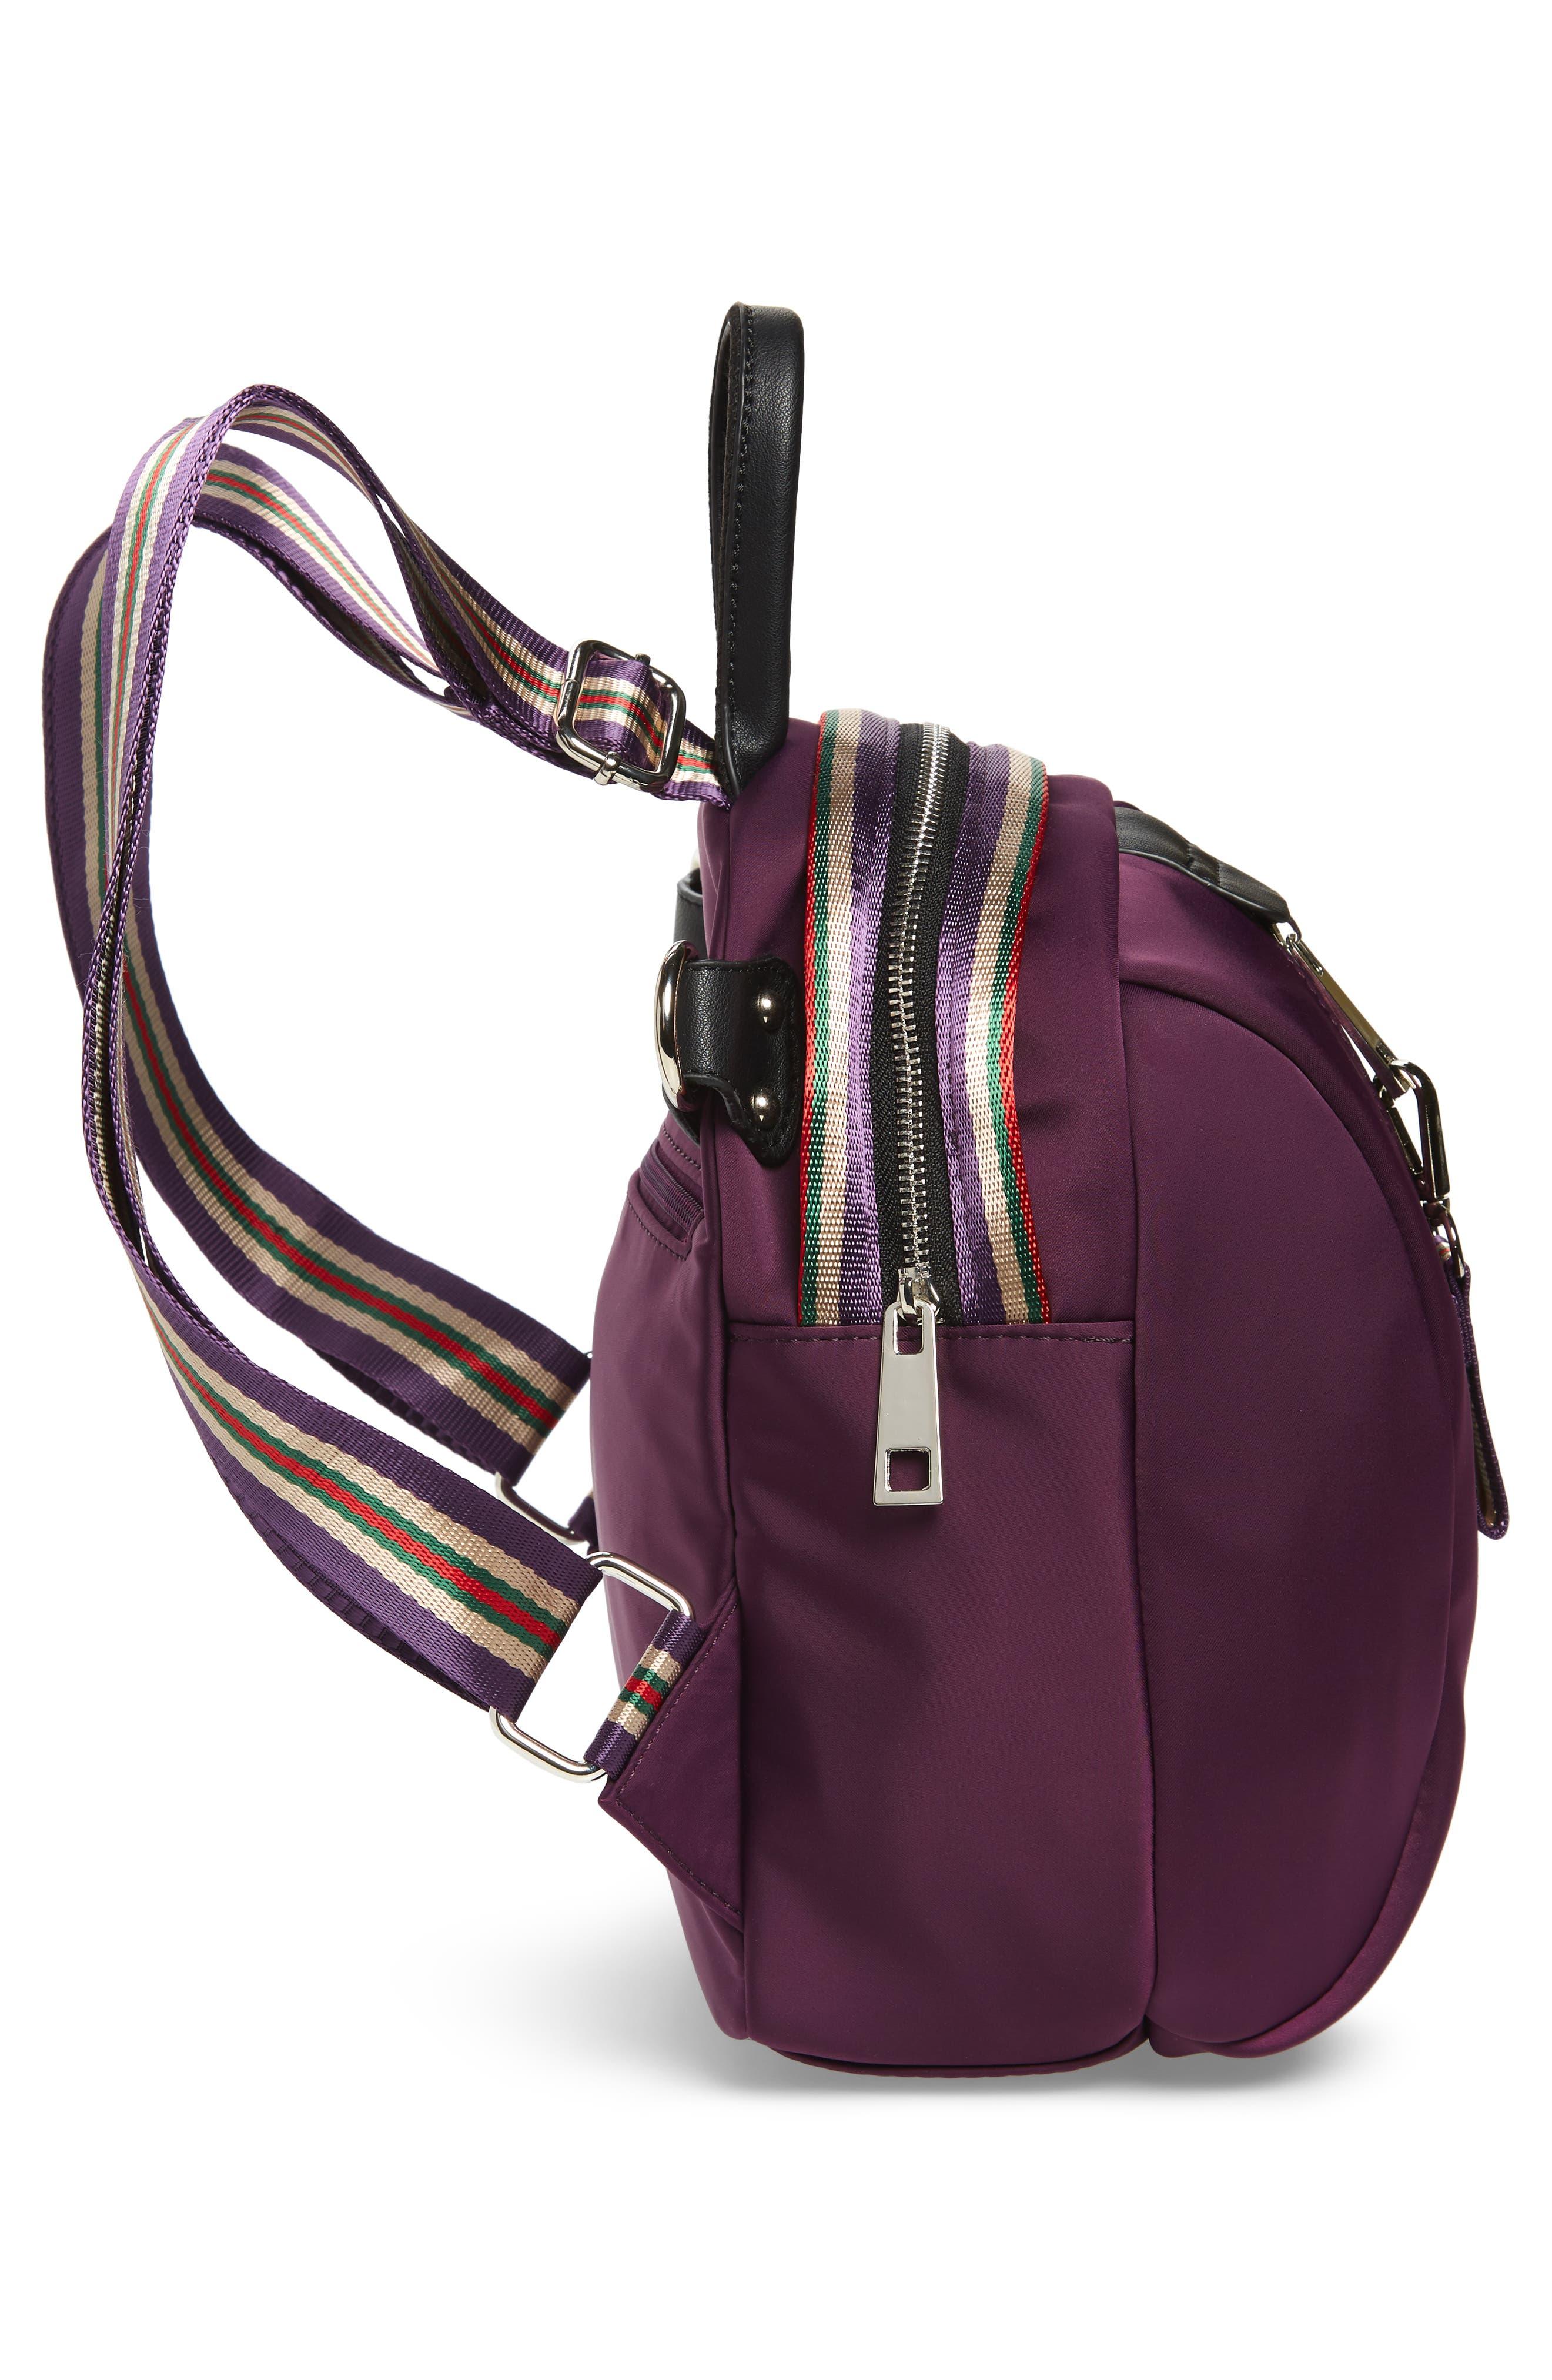 Satin Nylon & Webbing Convertible Backpack,                             Alternate thumbnail 6, color,                             PURPLE